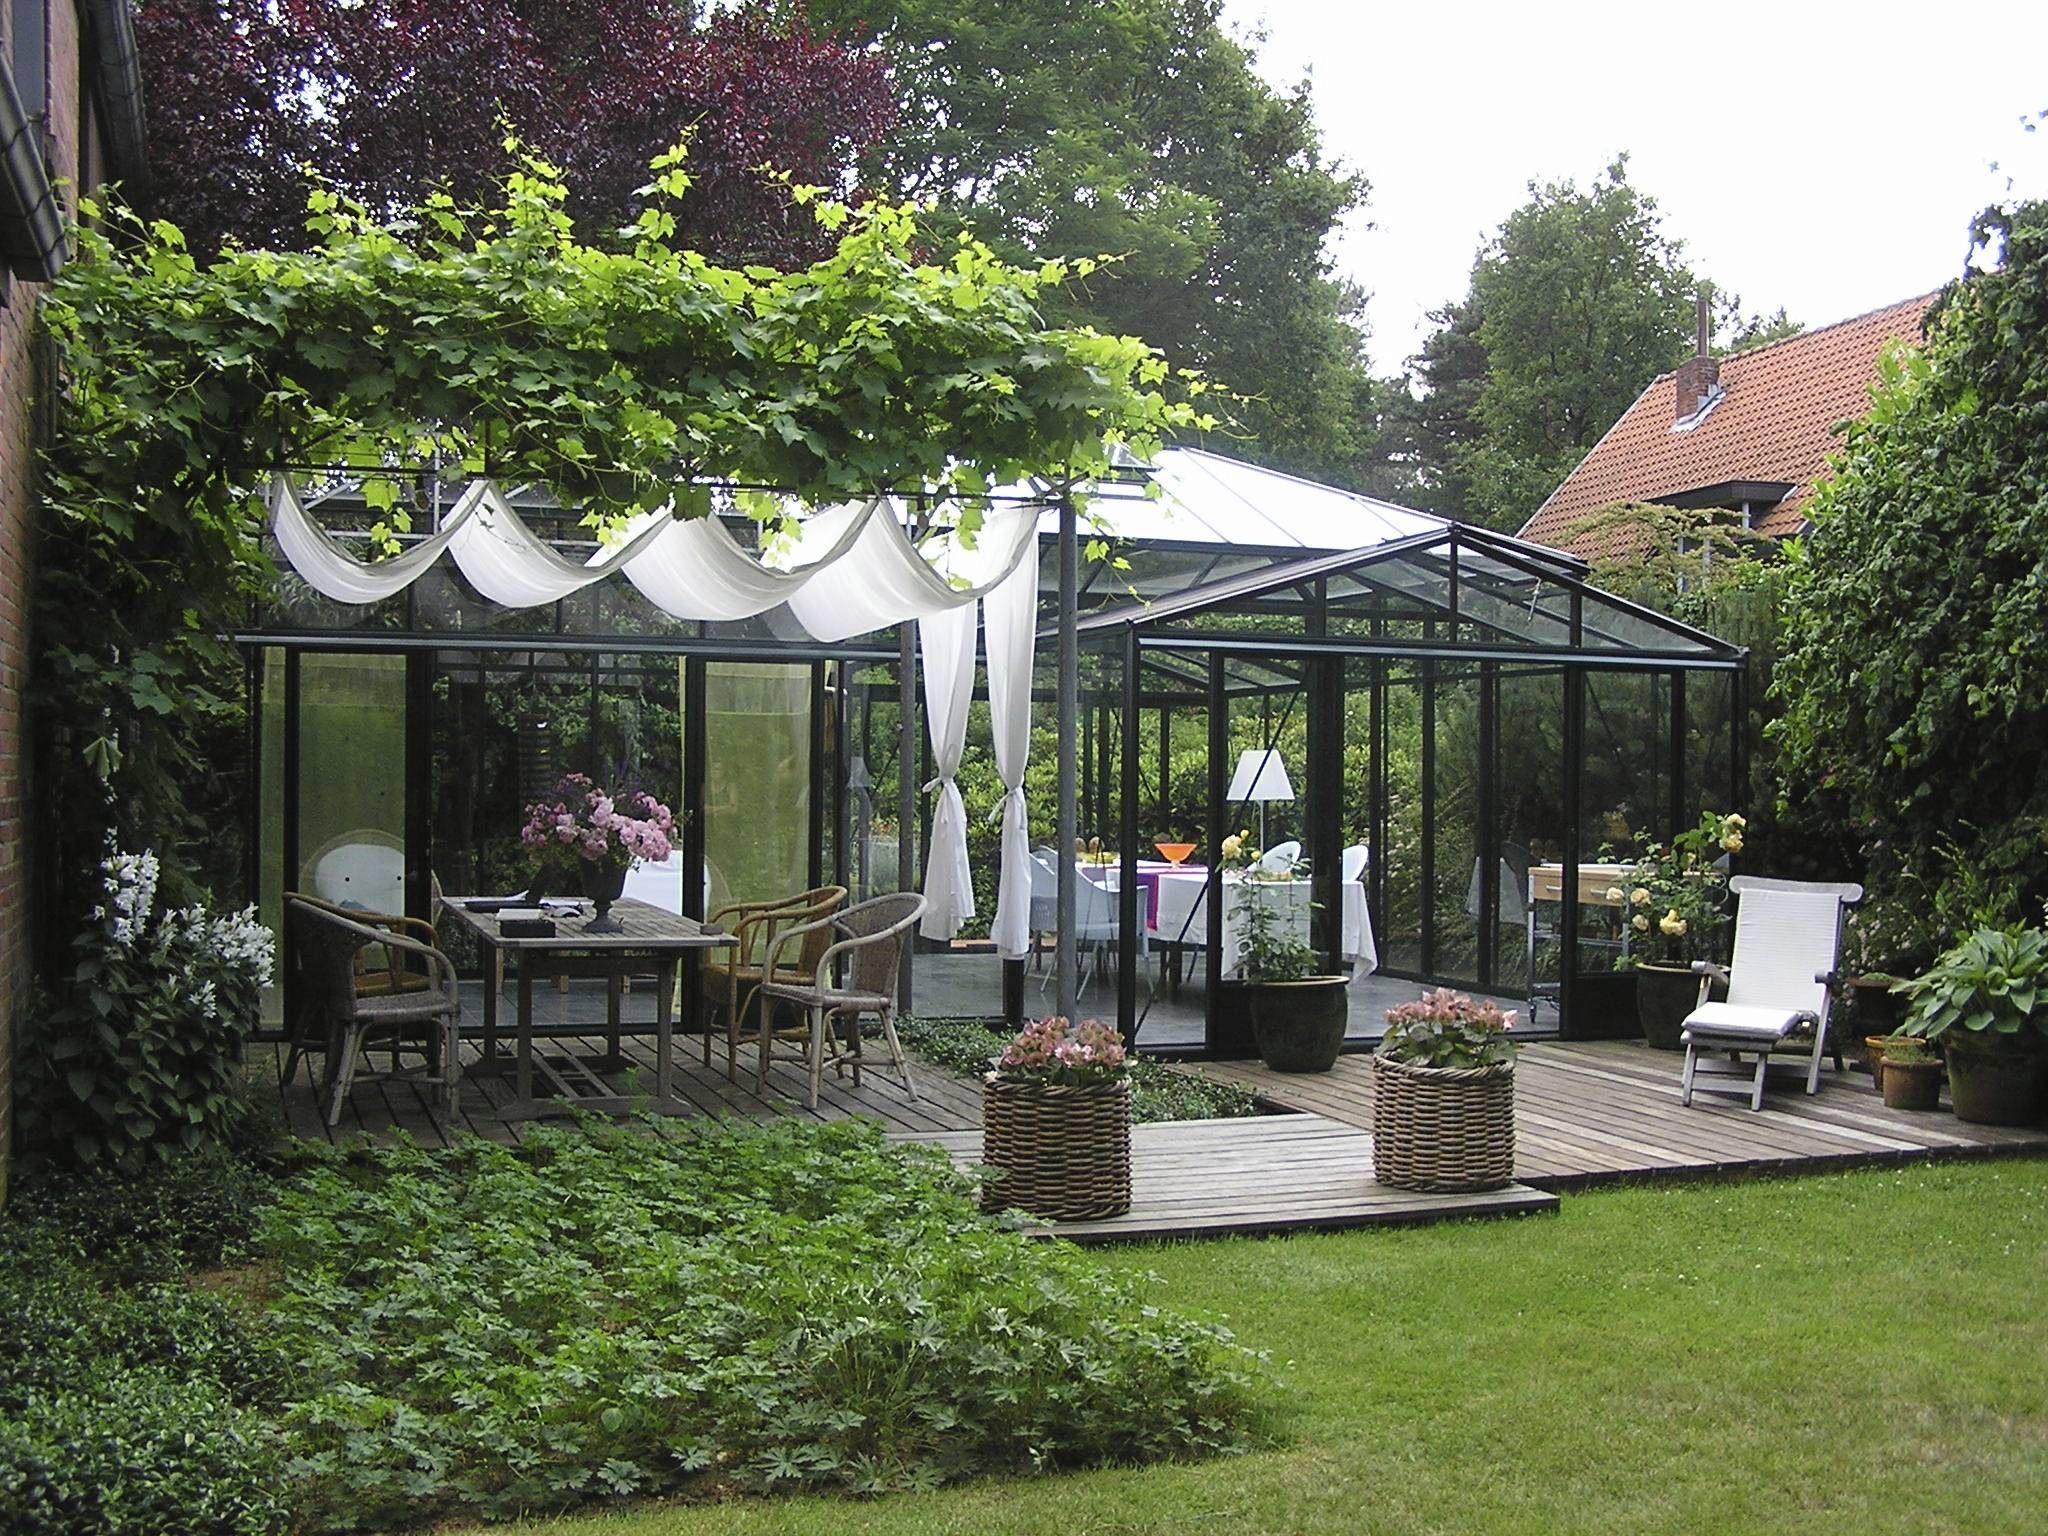 bildergebnis f r extension veranda windfang garten pinterest windfang und g rten. Black Bedroom Furniture Sets. Home Design Ideas